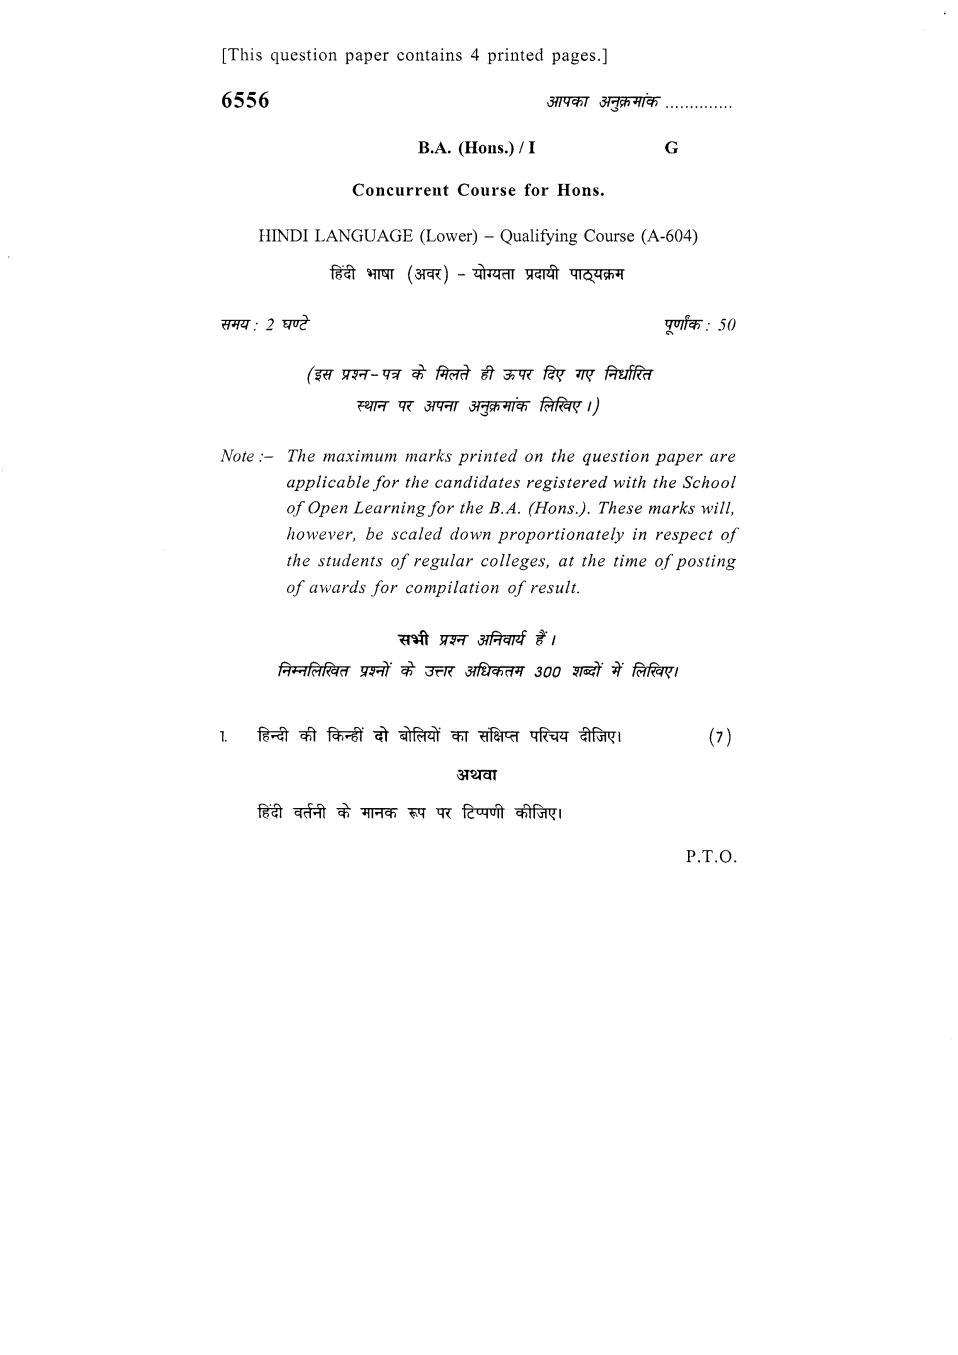 DU SOL Question Paper 2018 BA (Hons.) English - Hindi Language - Page 1